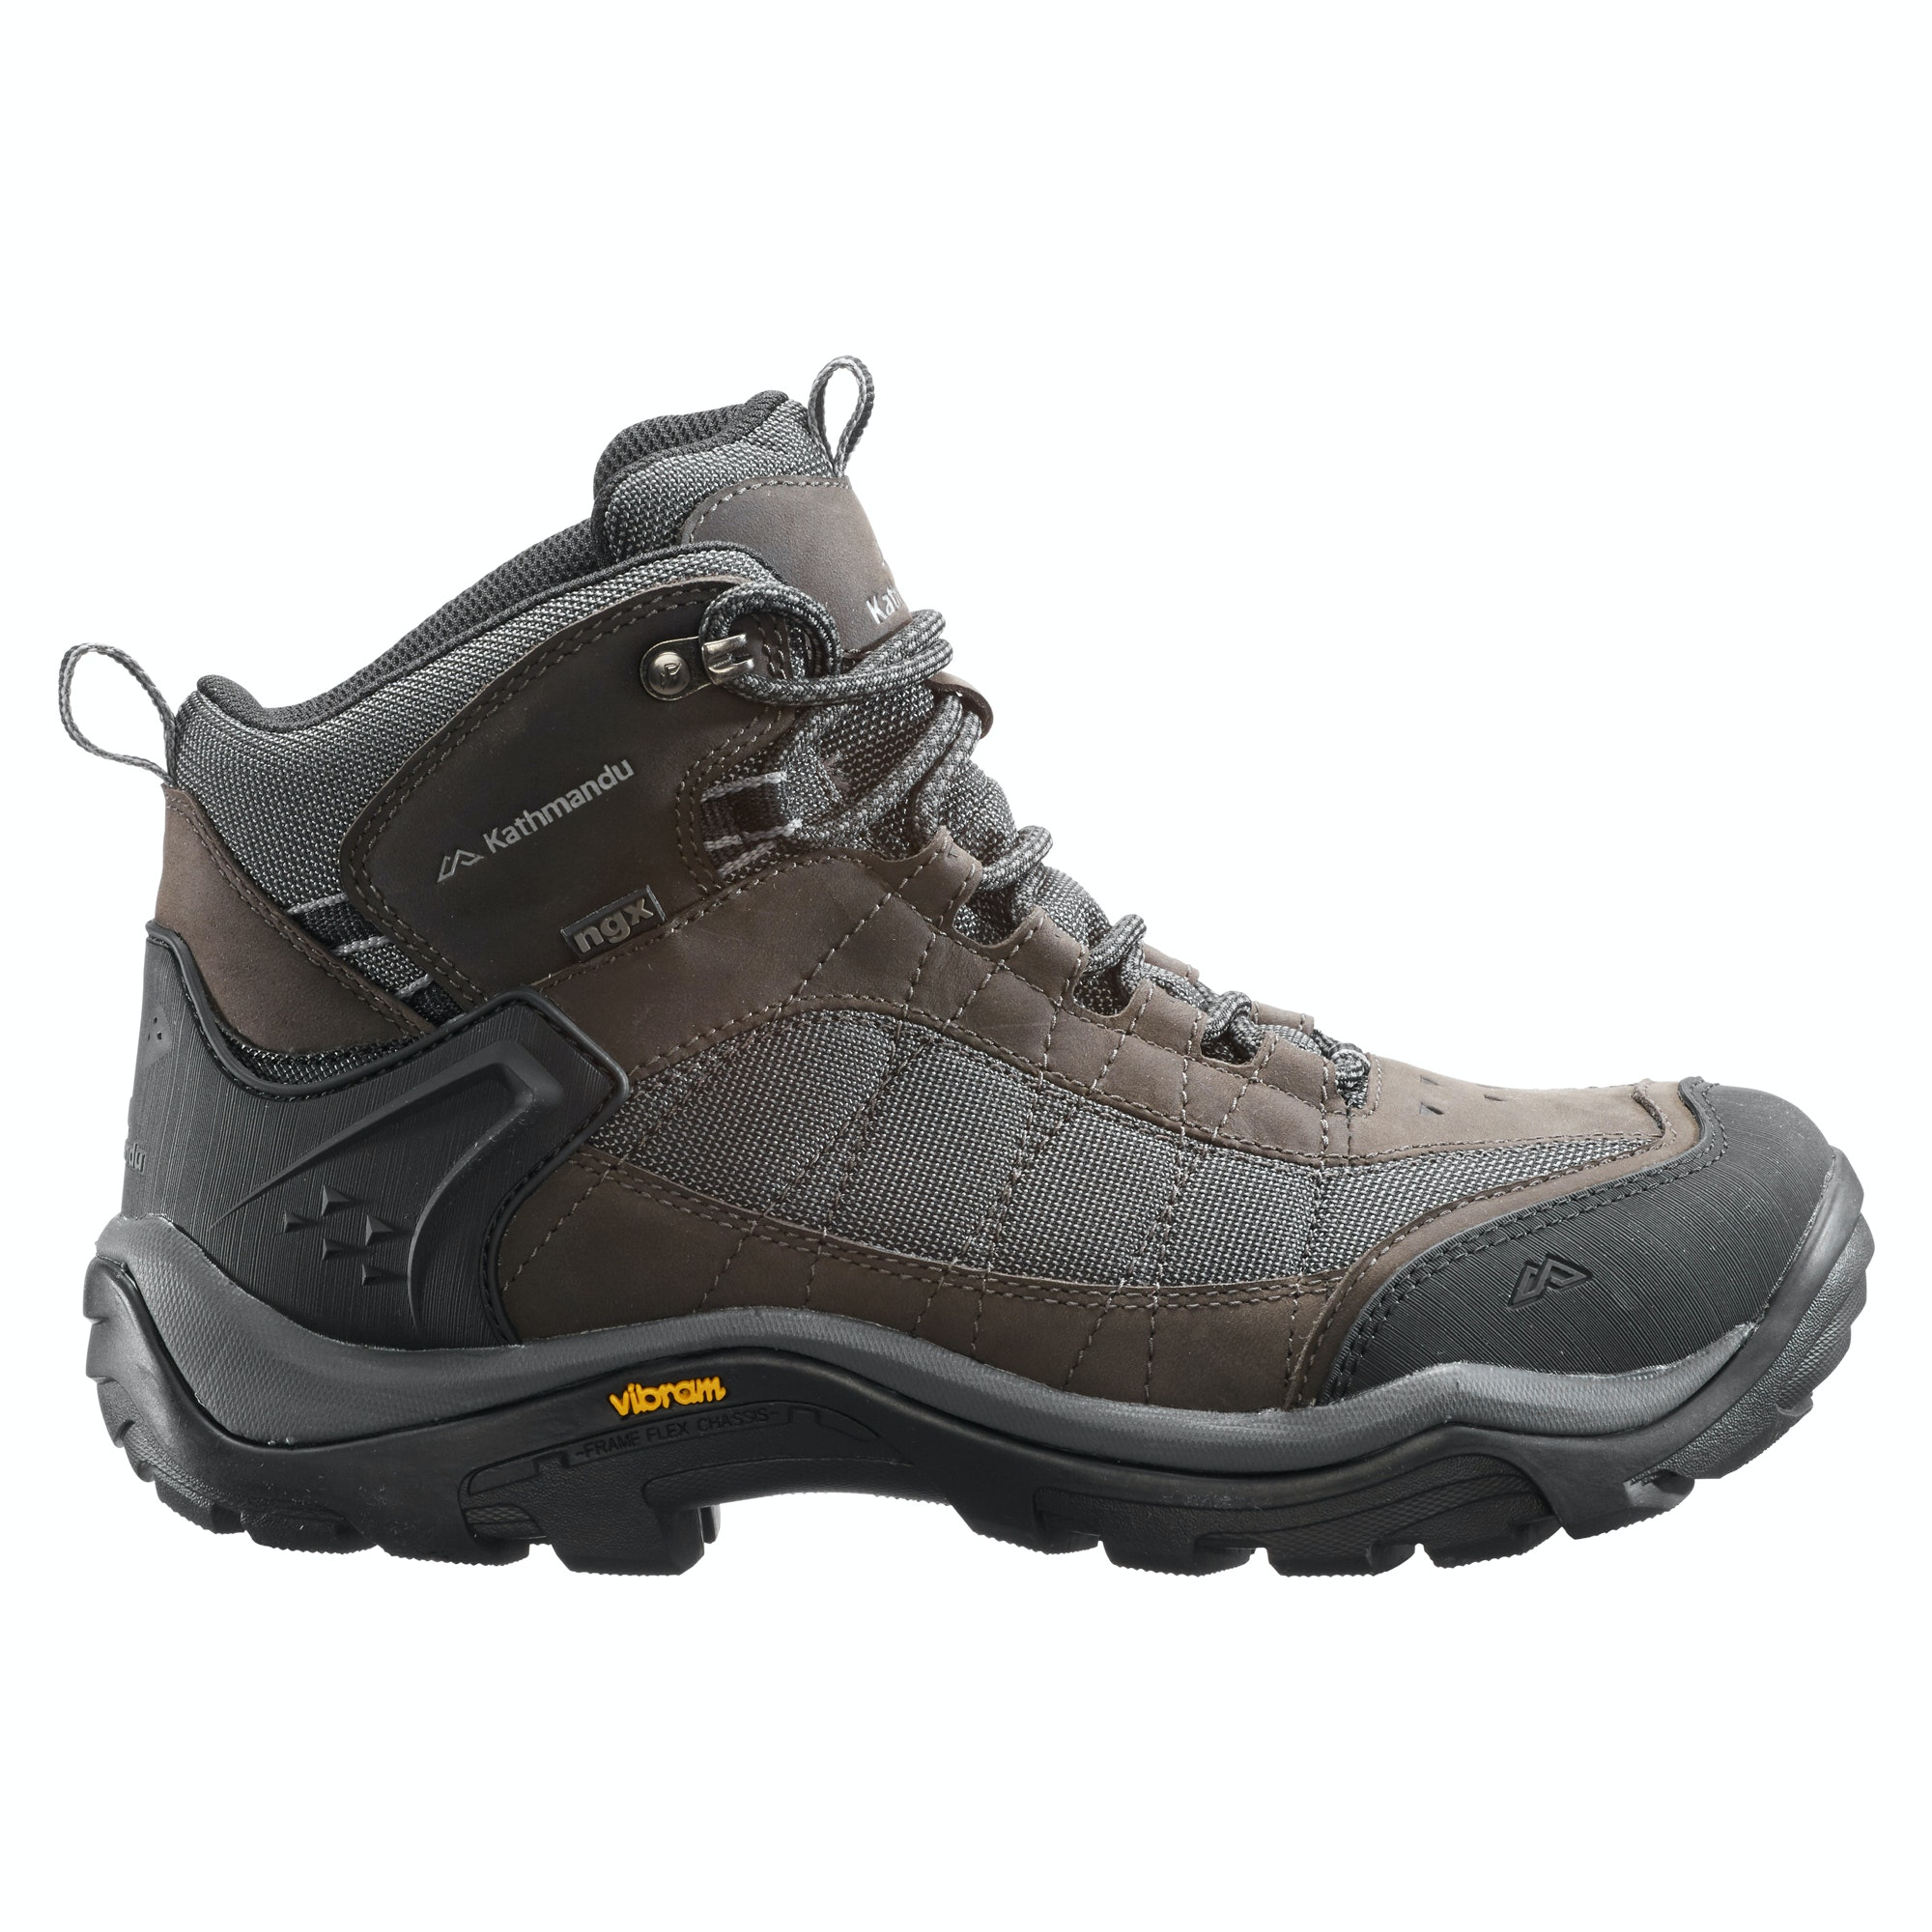 NEW-Kathmandu-Mornington-Mens-Vibram-Rubber-Waterproof-Lightweight-Hiking-Boots thumbnail 11